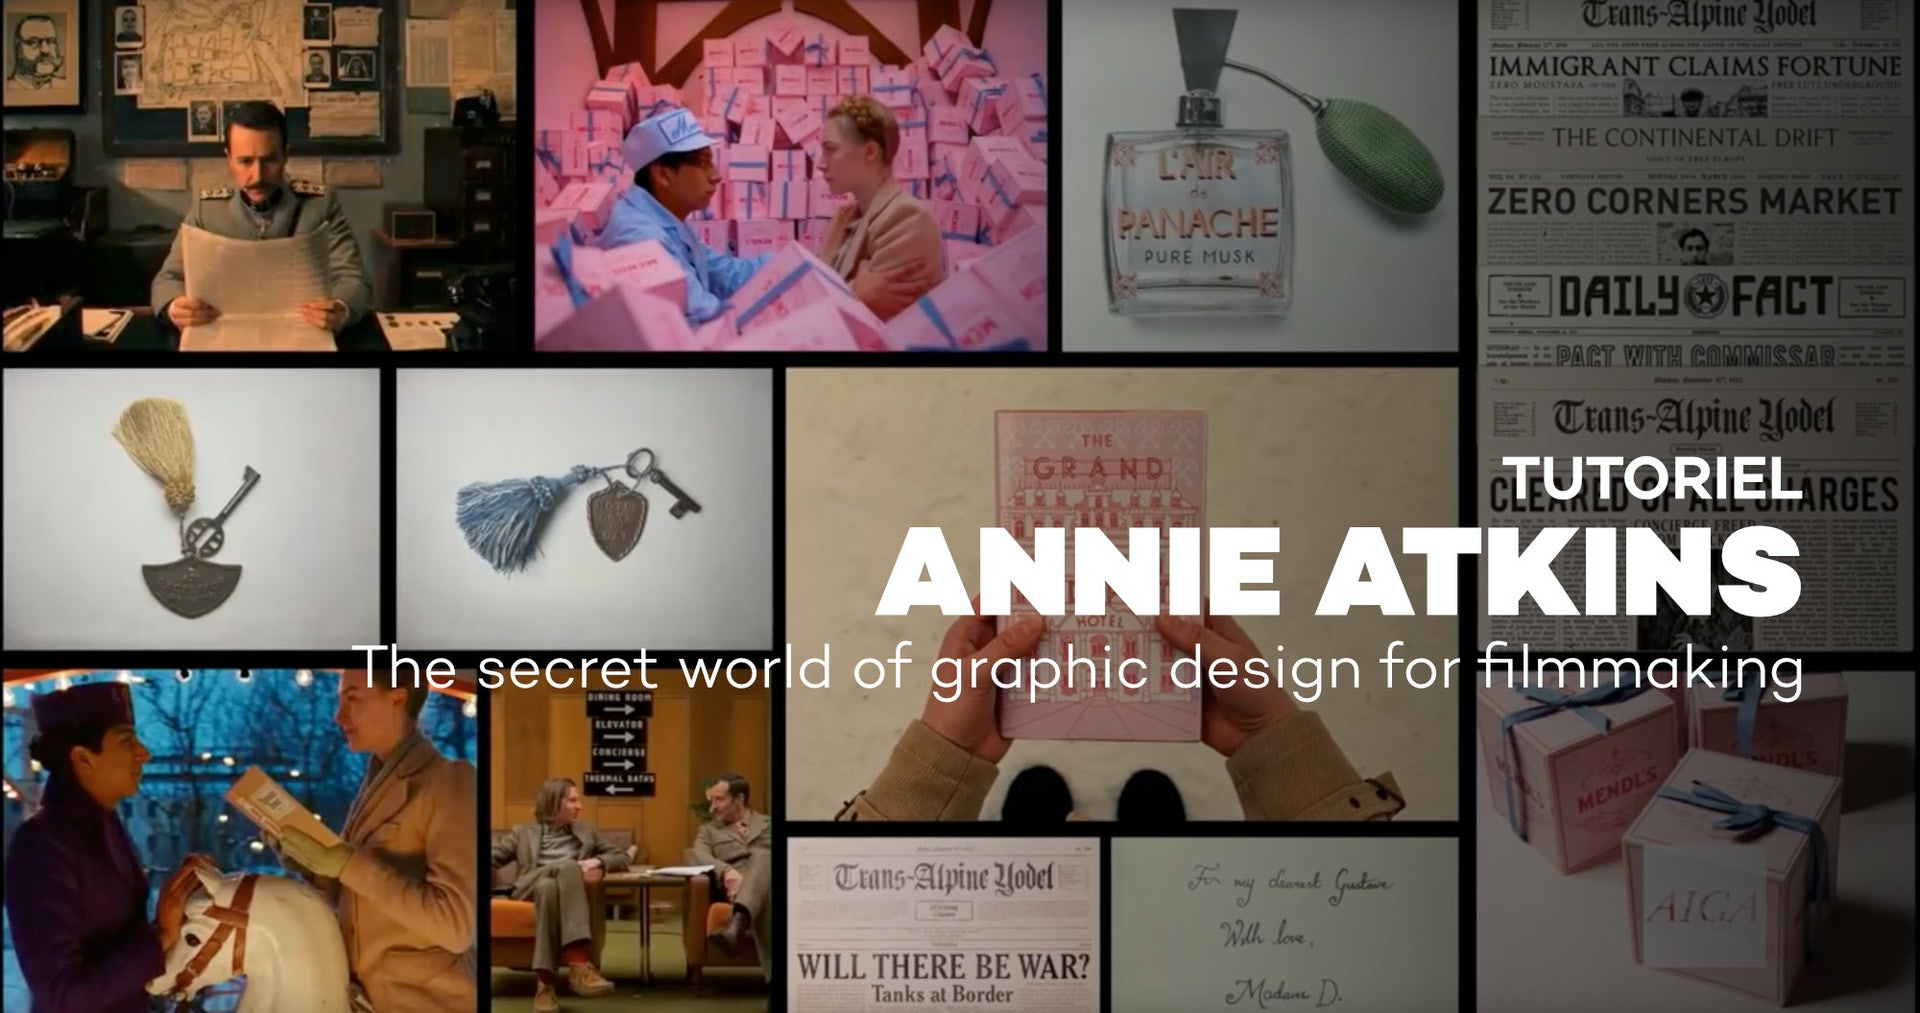 The secret world of graphic design for filmmaking